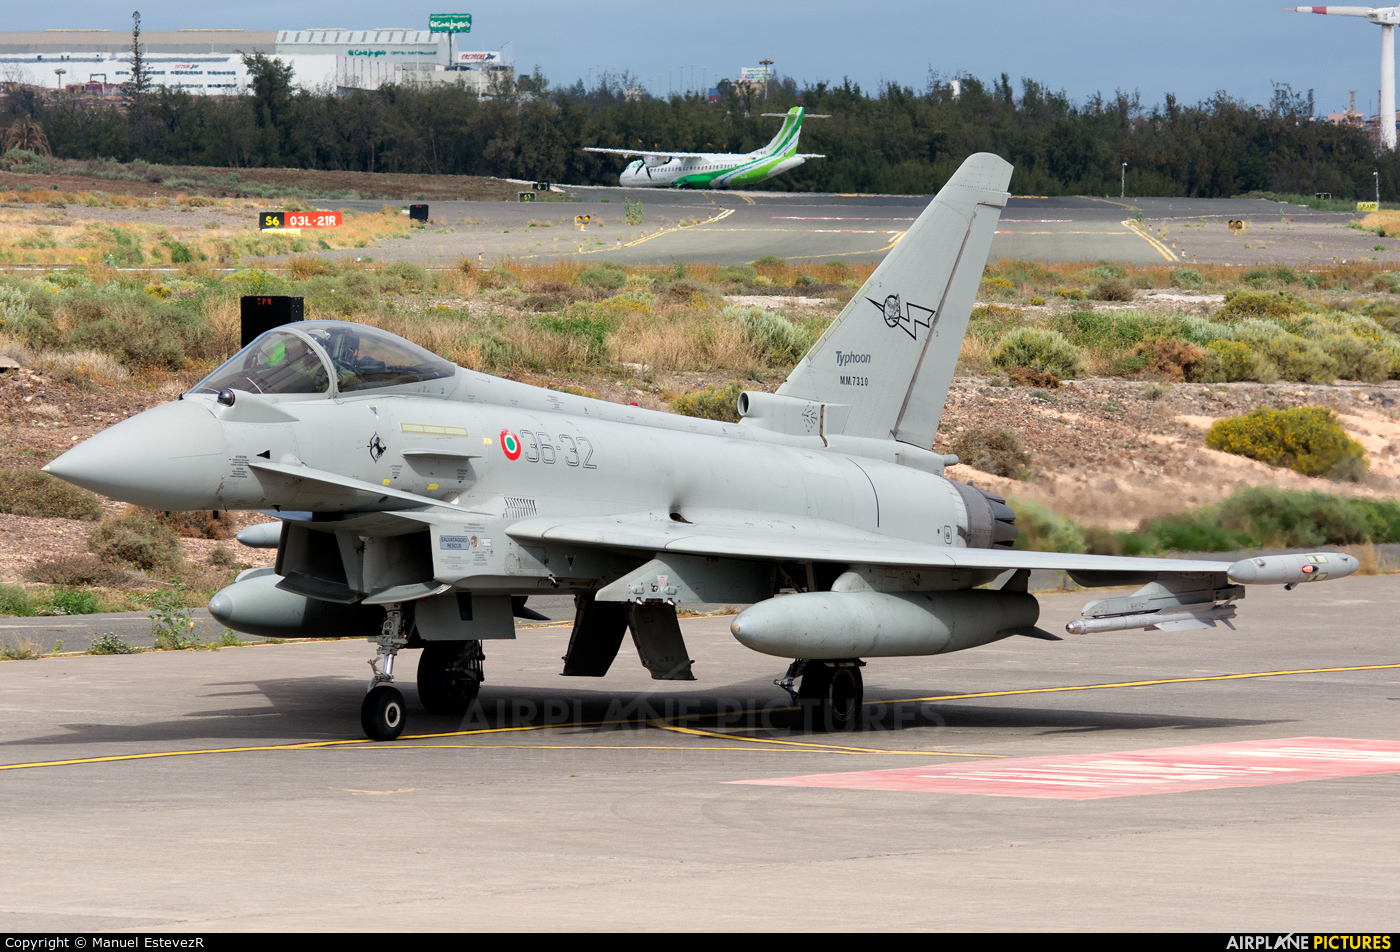 Italy - Air Force MM7310 aircraft at Aeropuerto de Gran Canaria